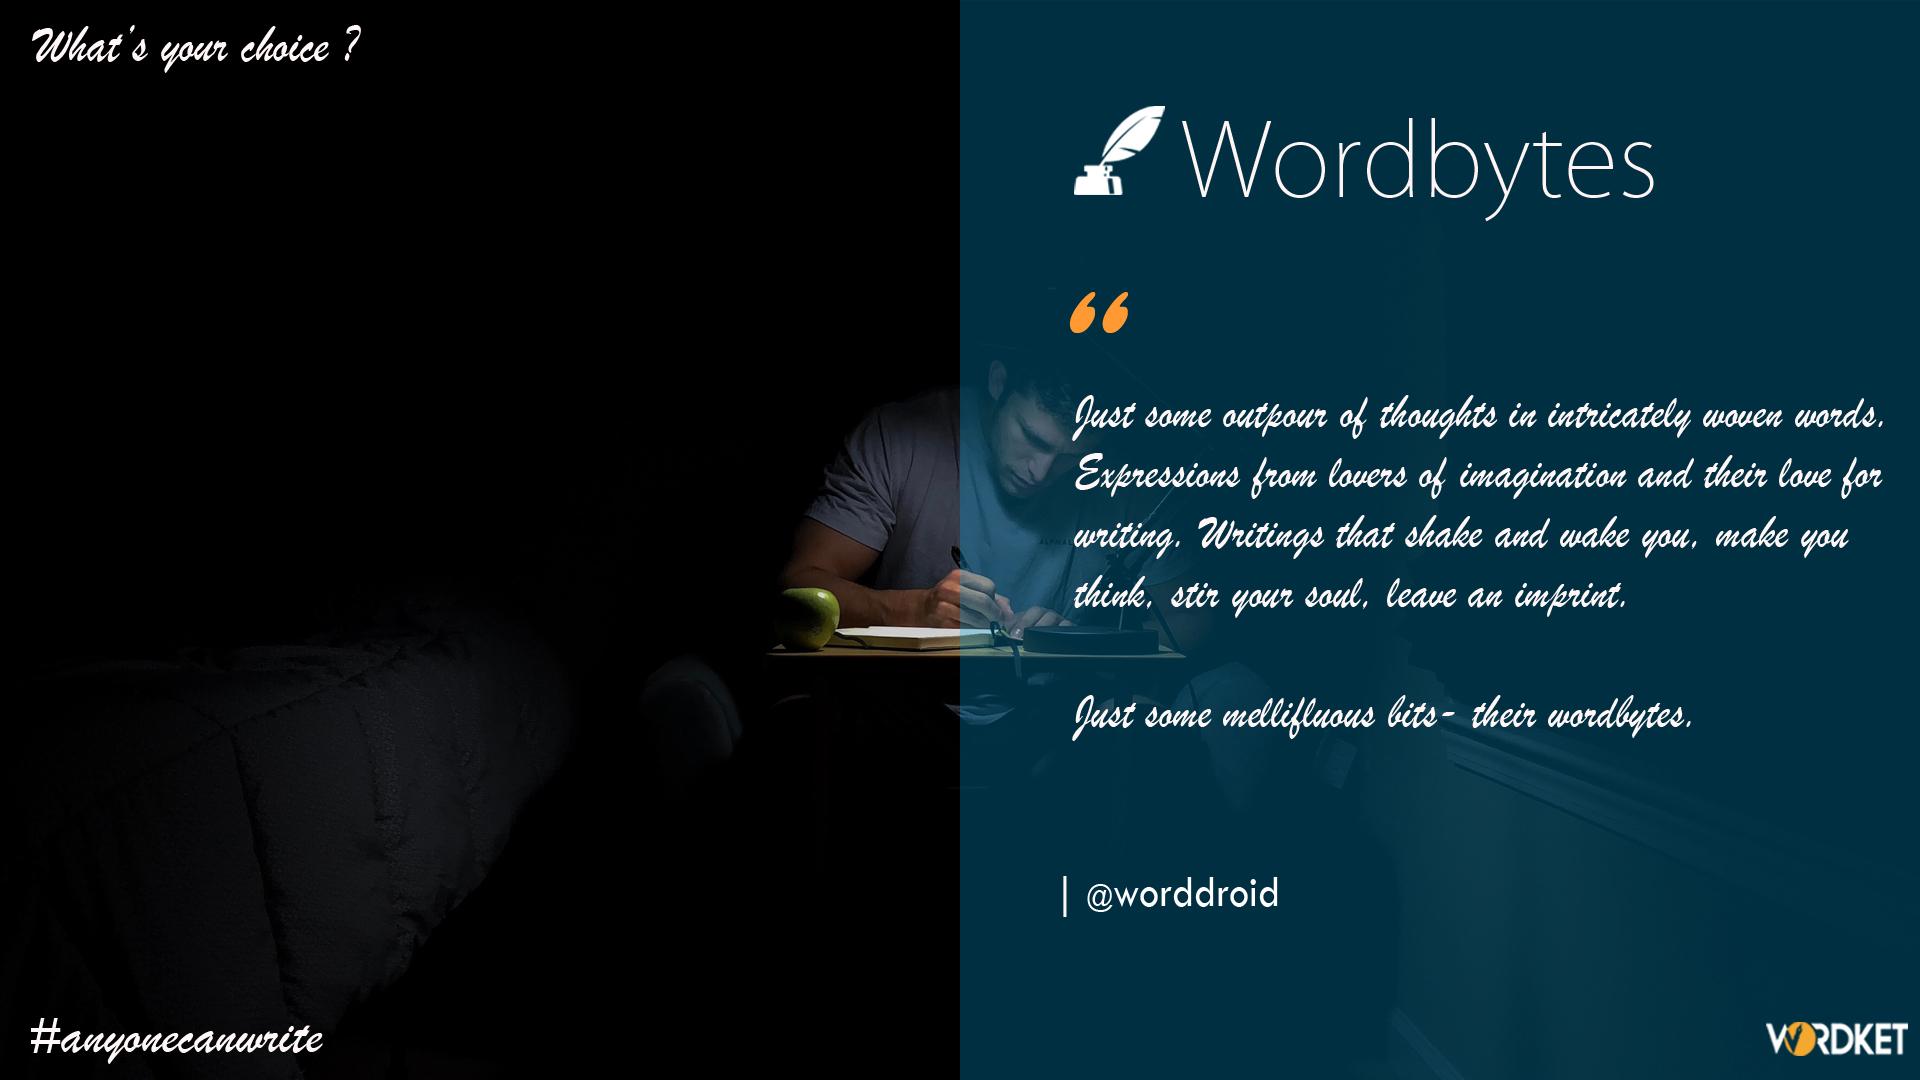 Wordbytes